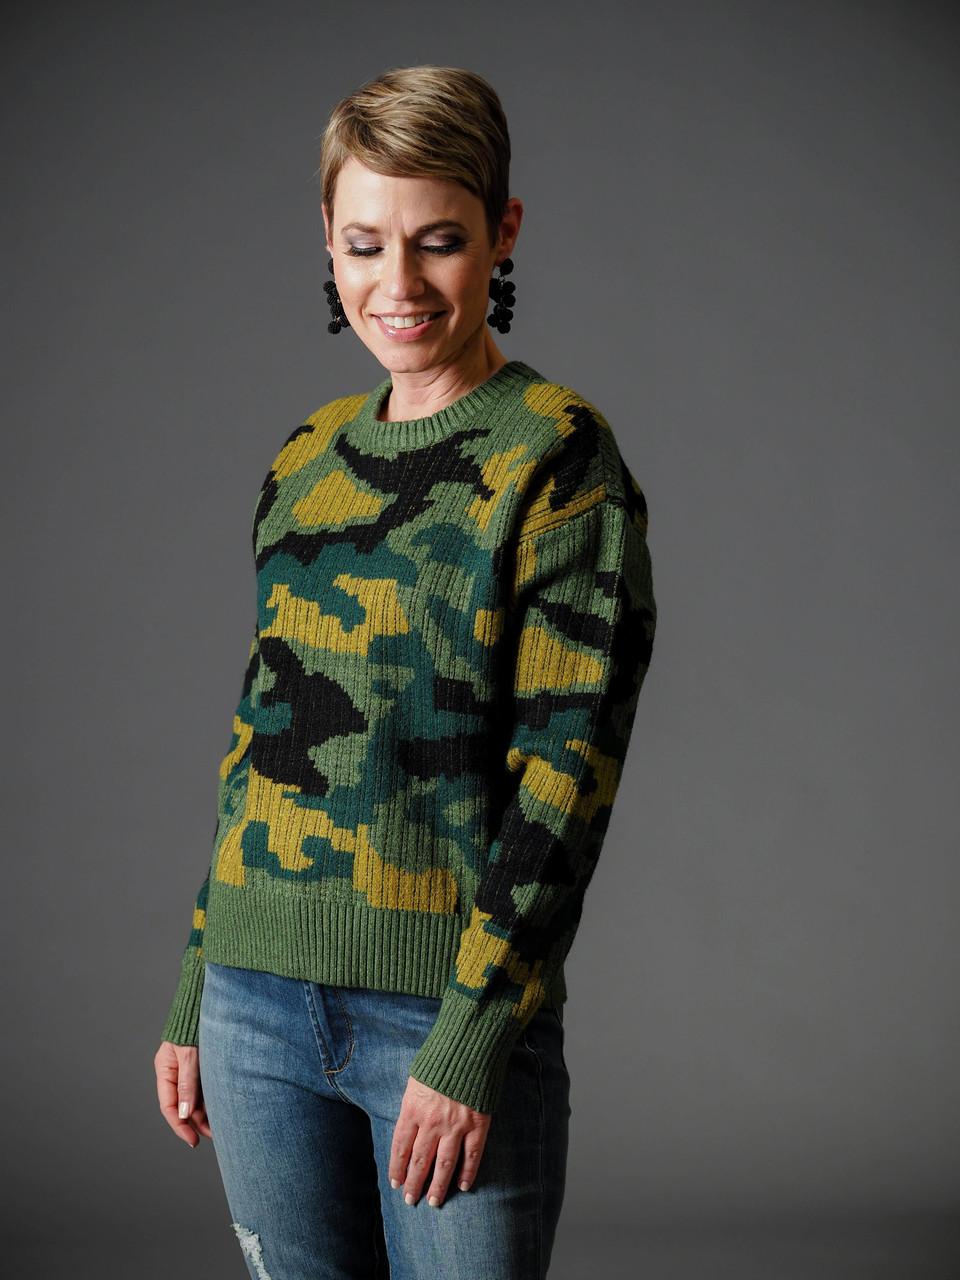 green yellow and black camo jacquard sweater